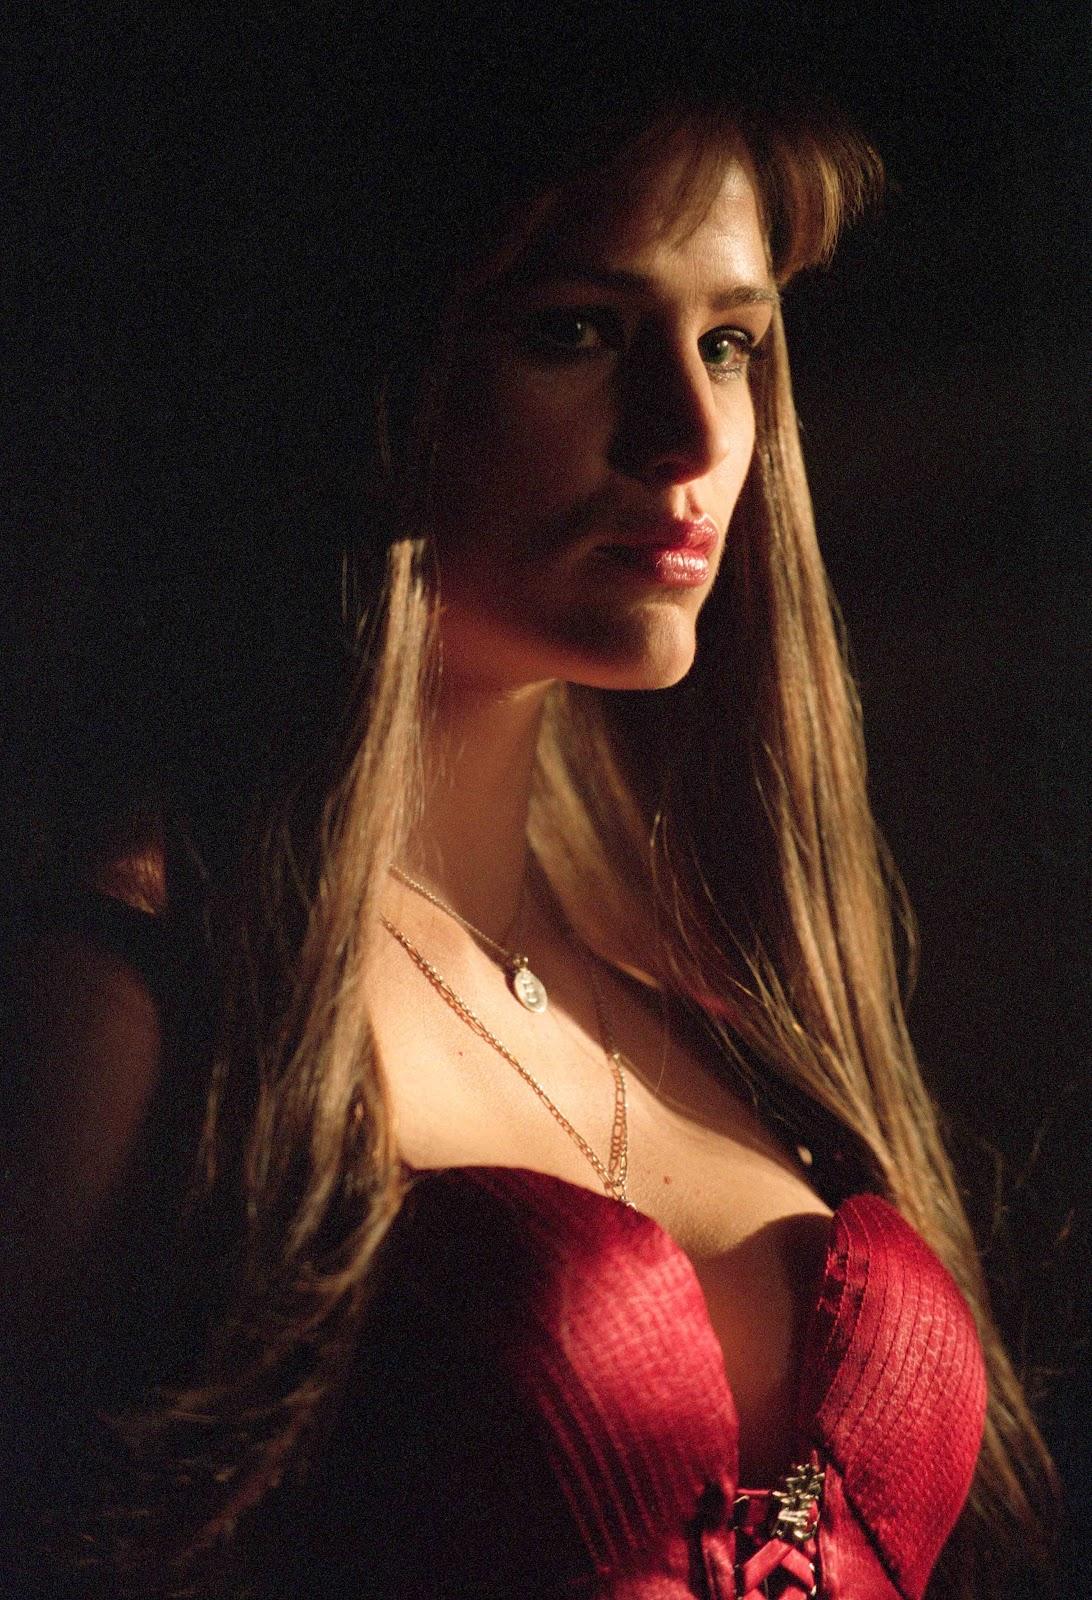 Jennifer garner sexy question